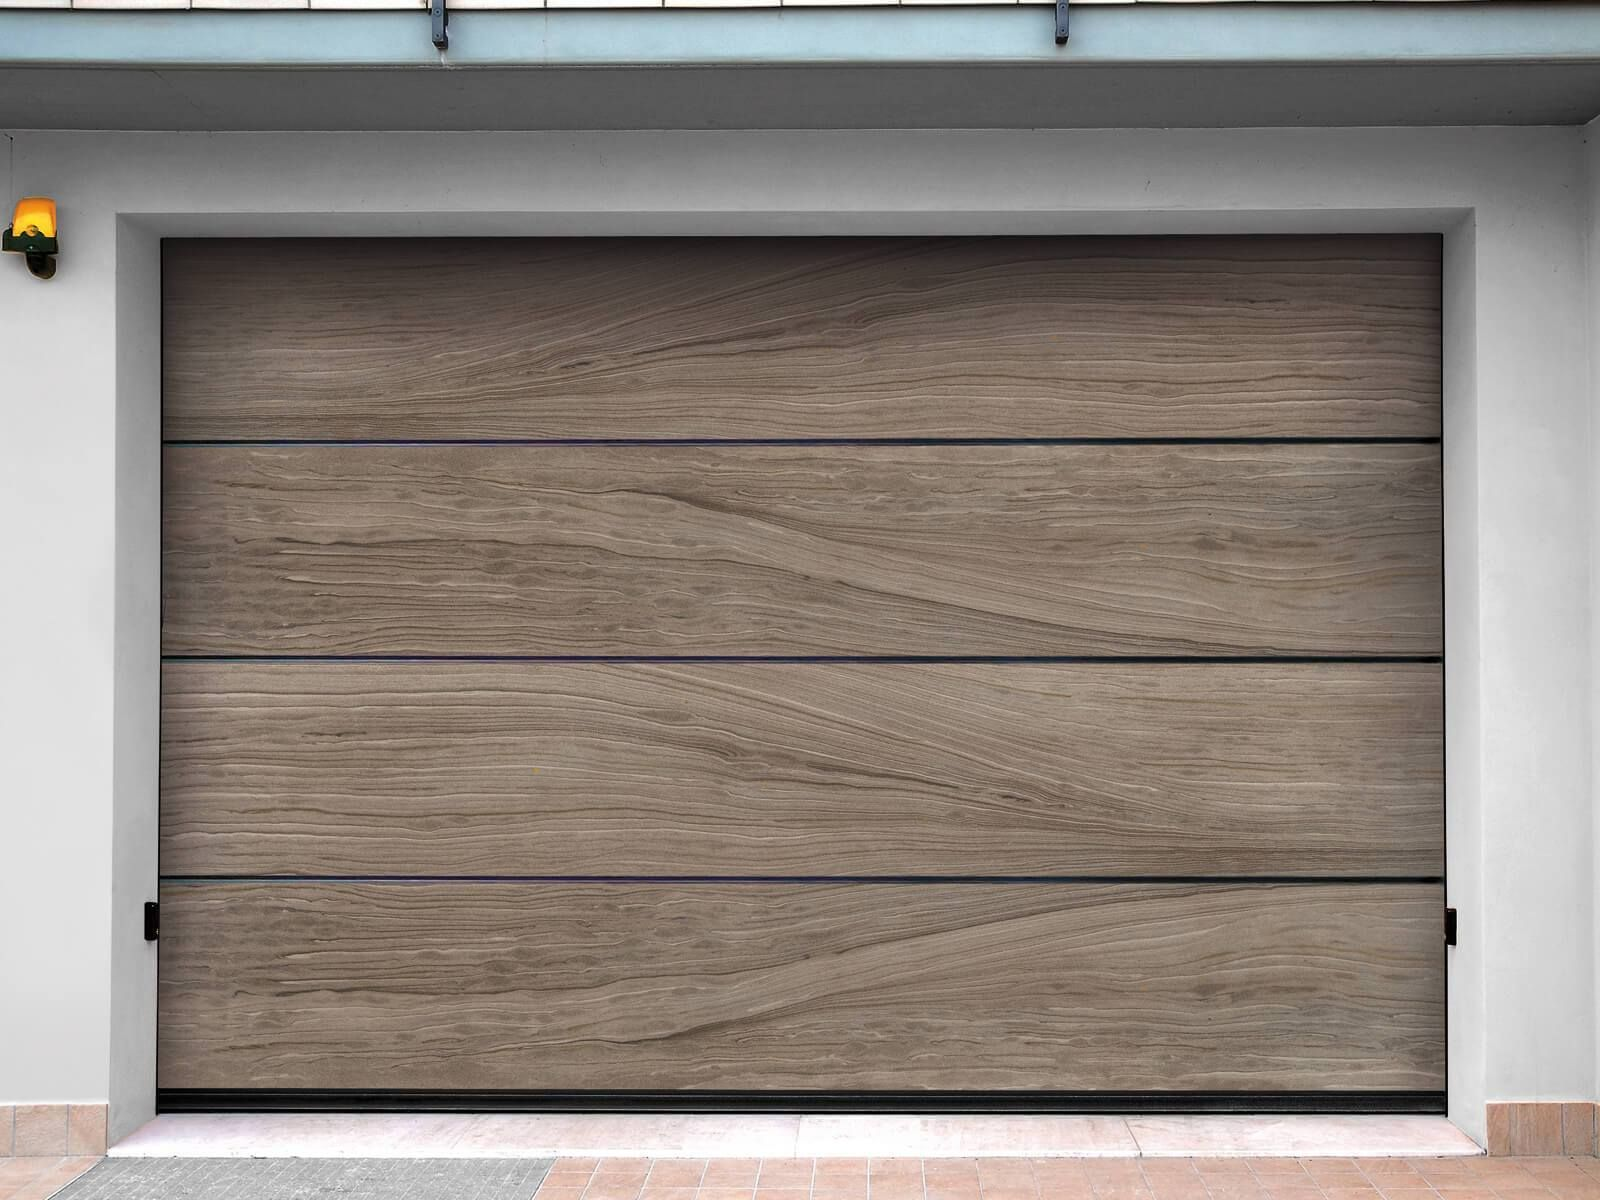 Le Perle Designer Overhead Garage Doors By Breda Are One Of A Kind Custom Garage Doors Whether It Is A Mas Garage Door Design Garage Doors Custom Garage Doors